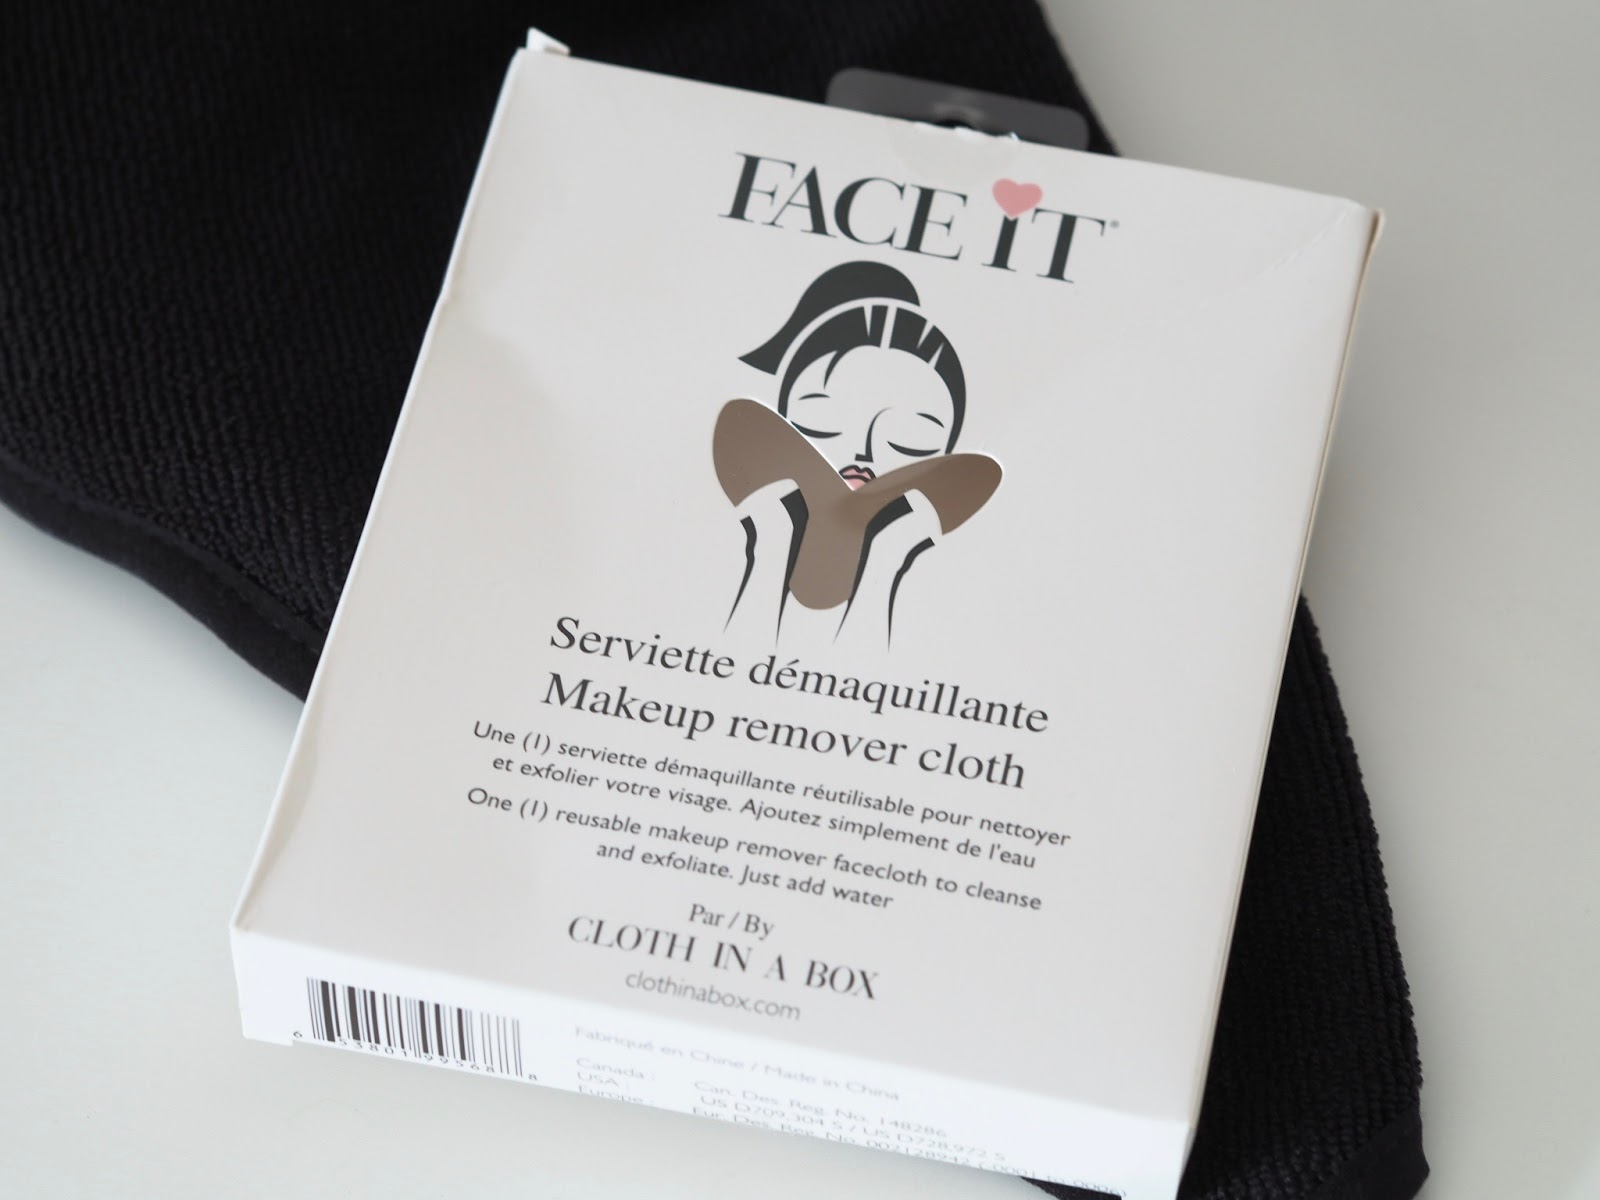 MakeupboxLDN make up remover cloth in black microfibre